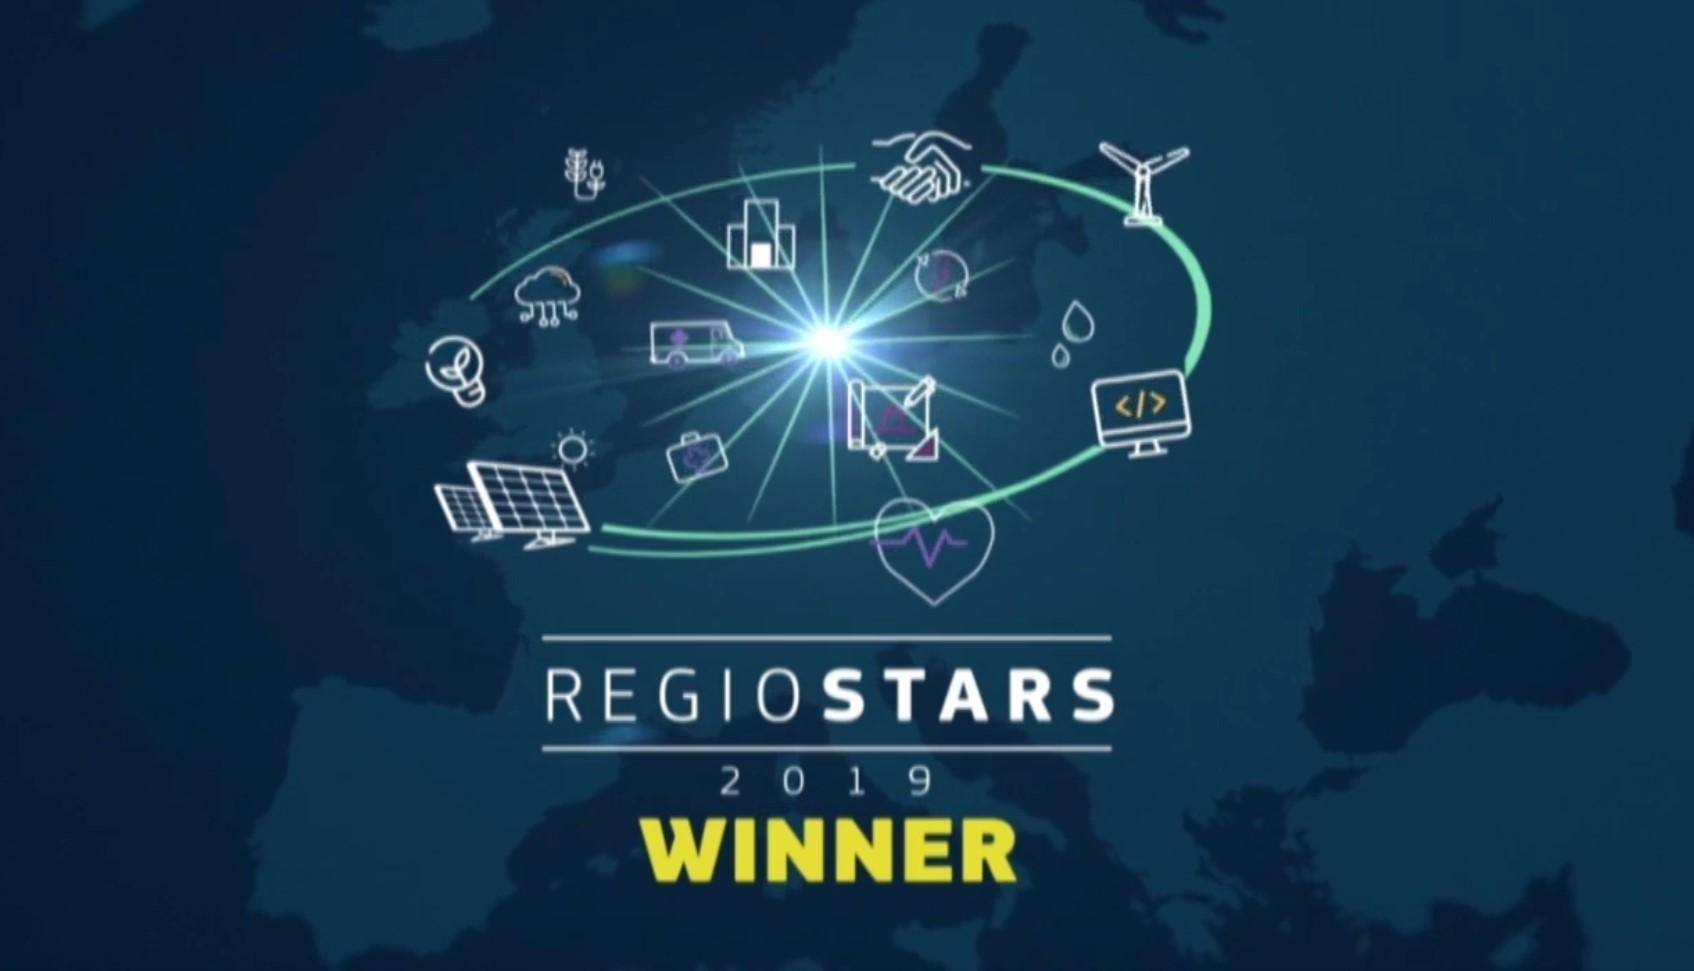 REGIOSTARS2019 WINNER 1